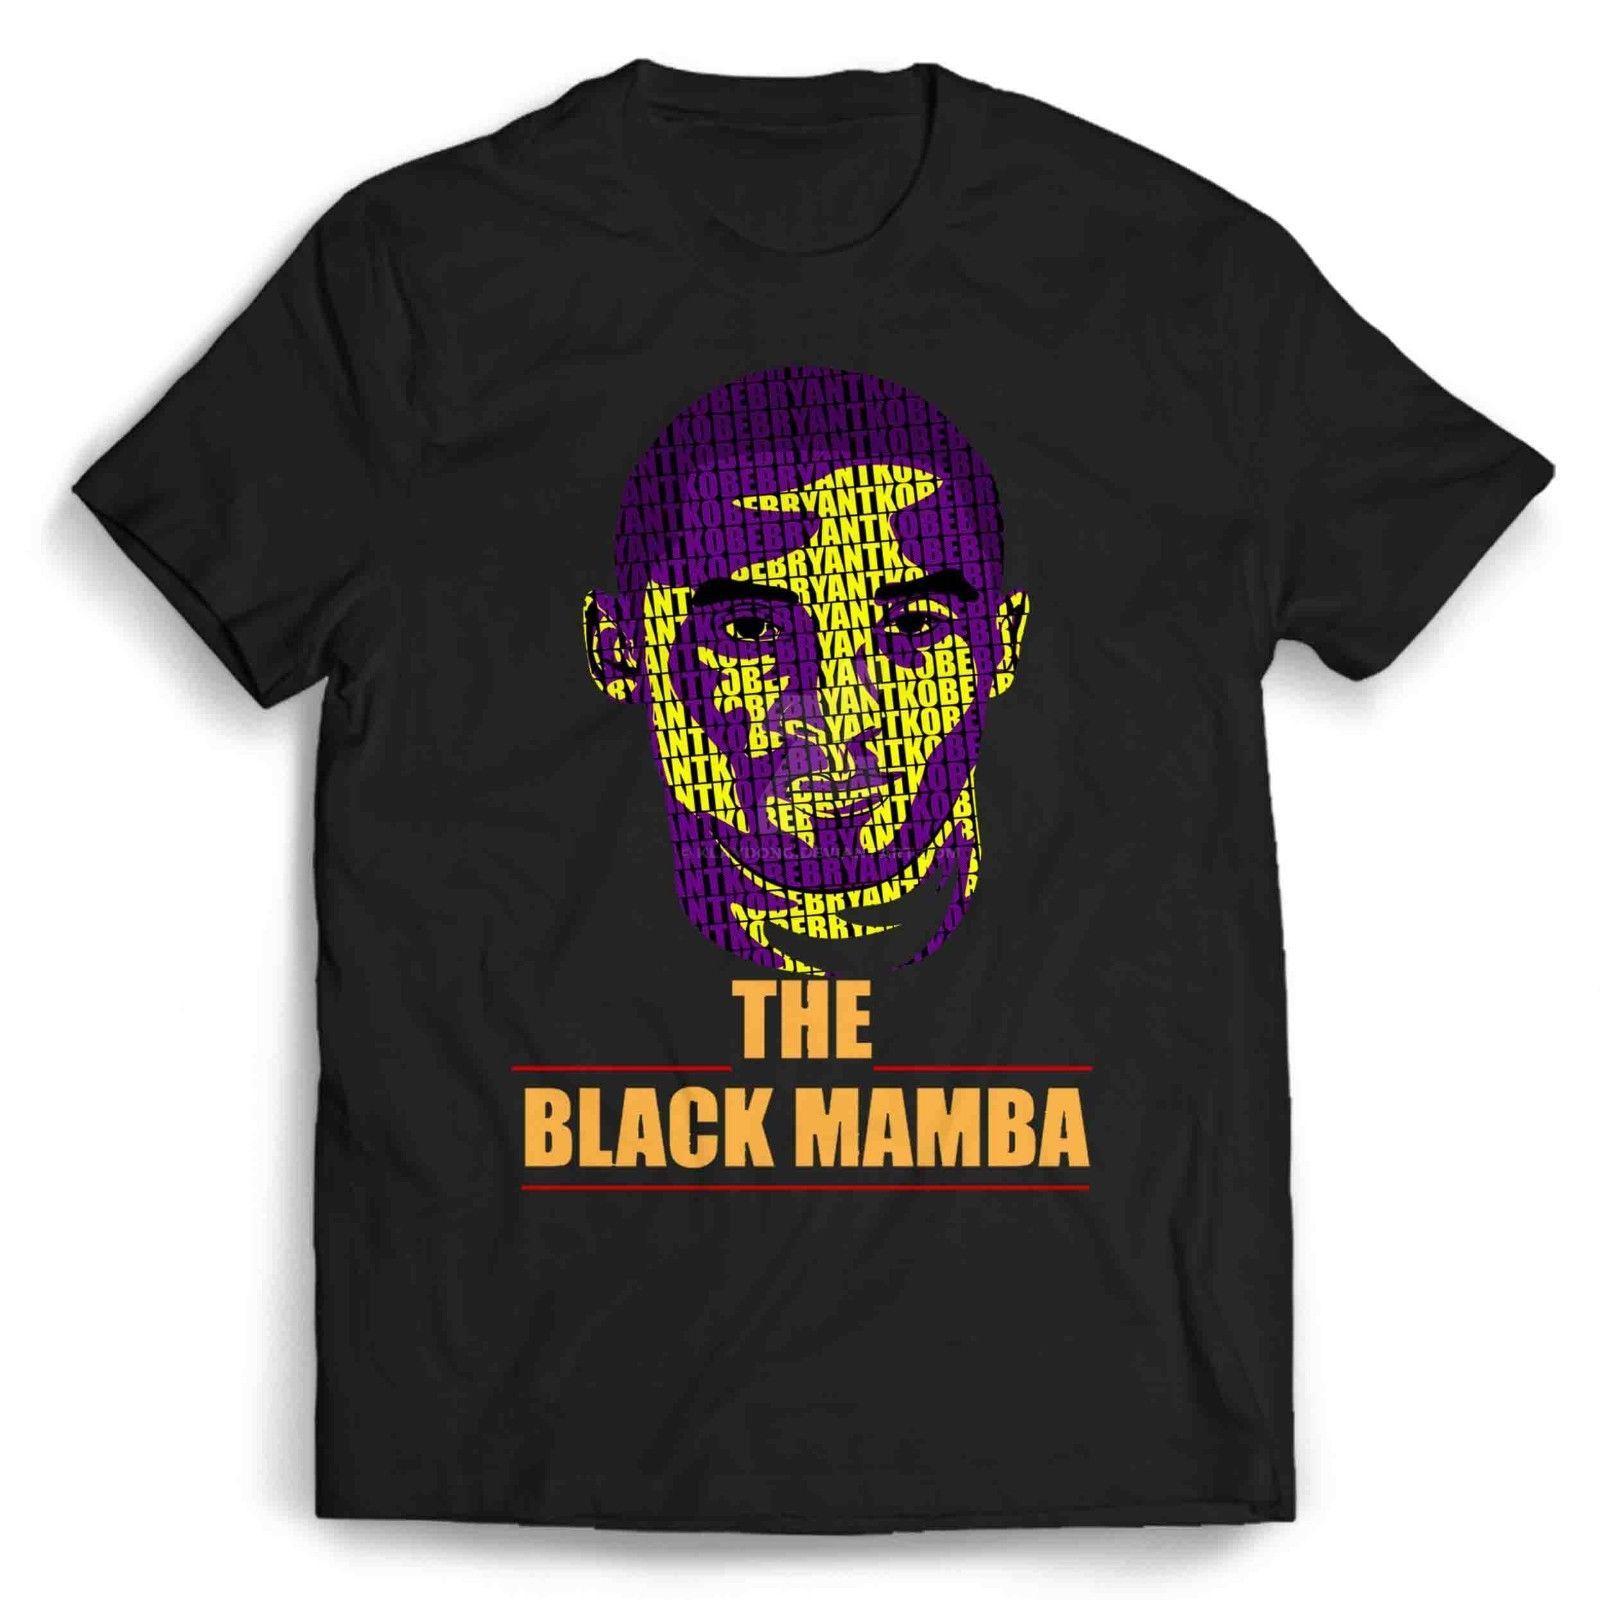 Kobe Bryant Black Mamba Logo Men S   Women S T Shirt 2018 100% Cotton Print  Mens Summer O Neck T Shirt Shopping T Shirts Amusing T Shirts From ... fc4128c1d4